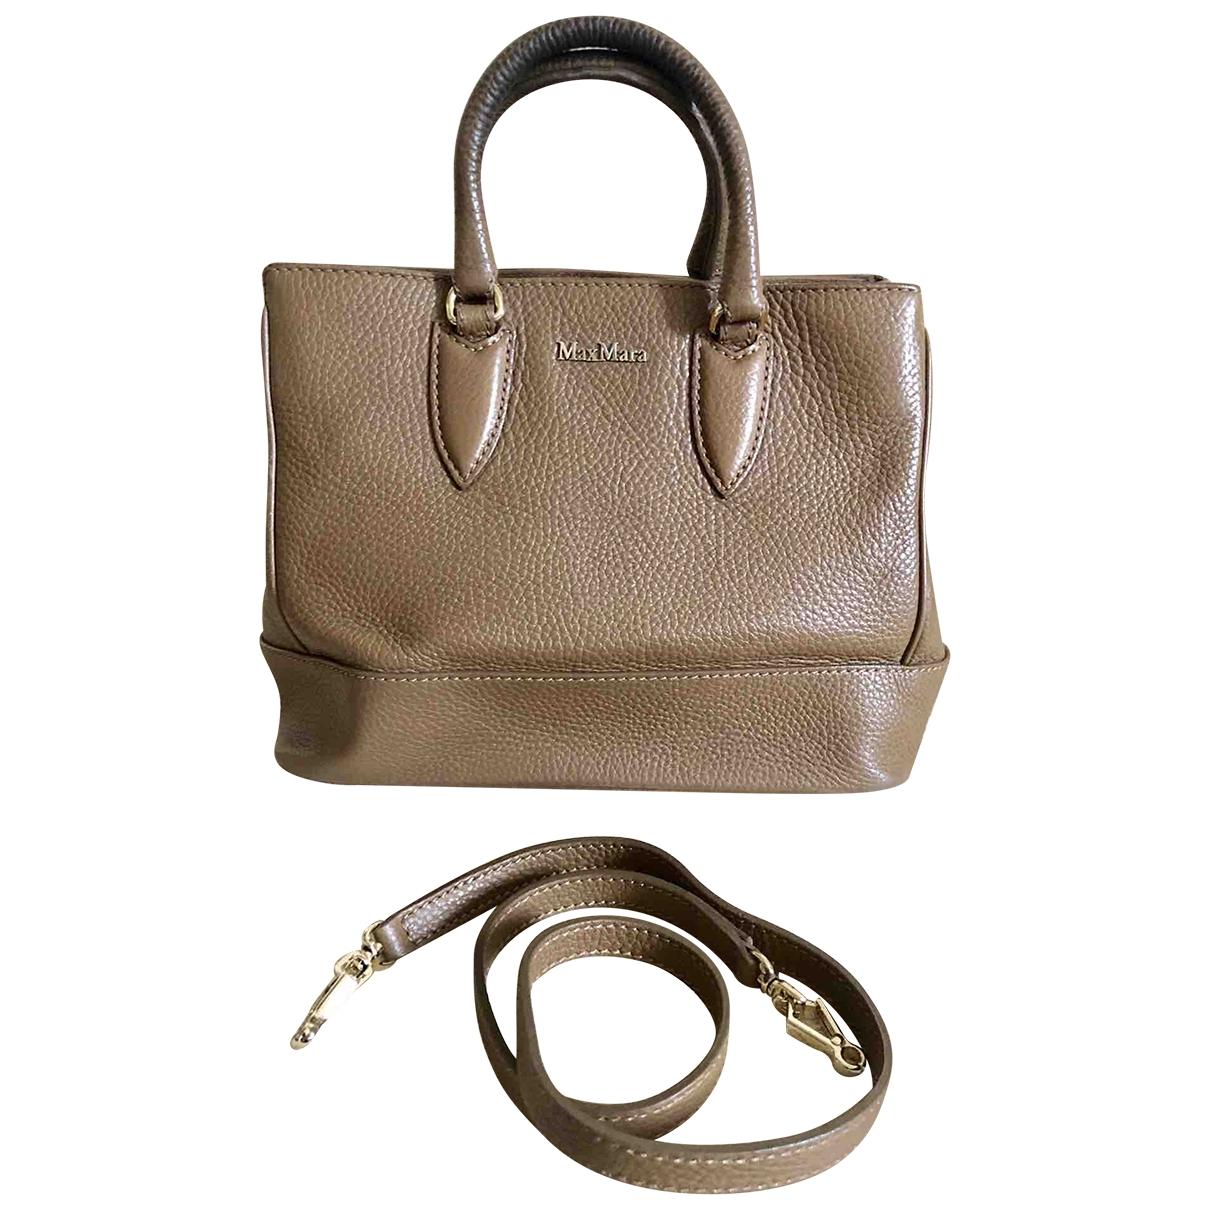 Max Mara \N Brown Leather handbag for Women \N